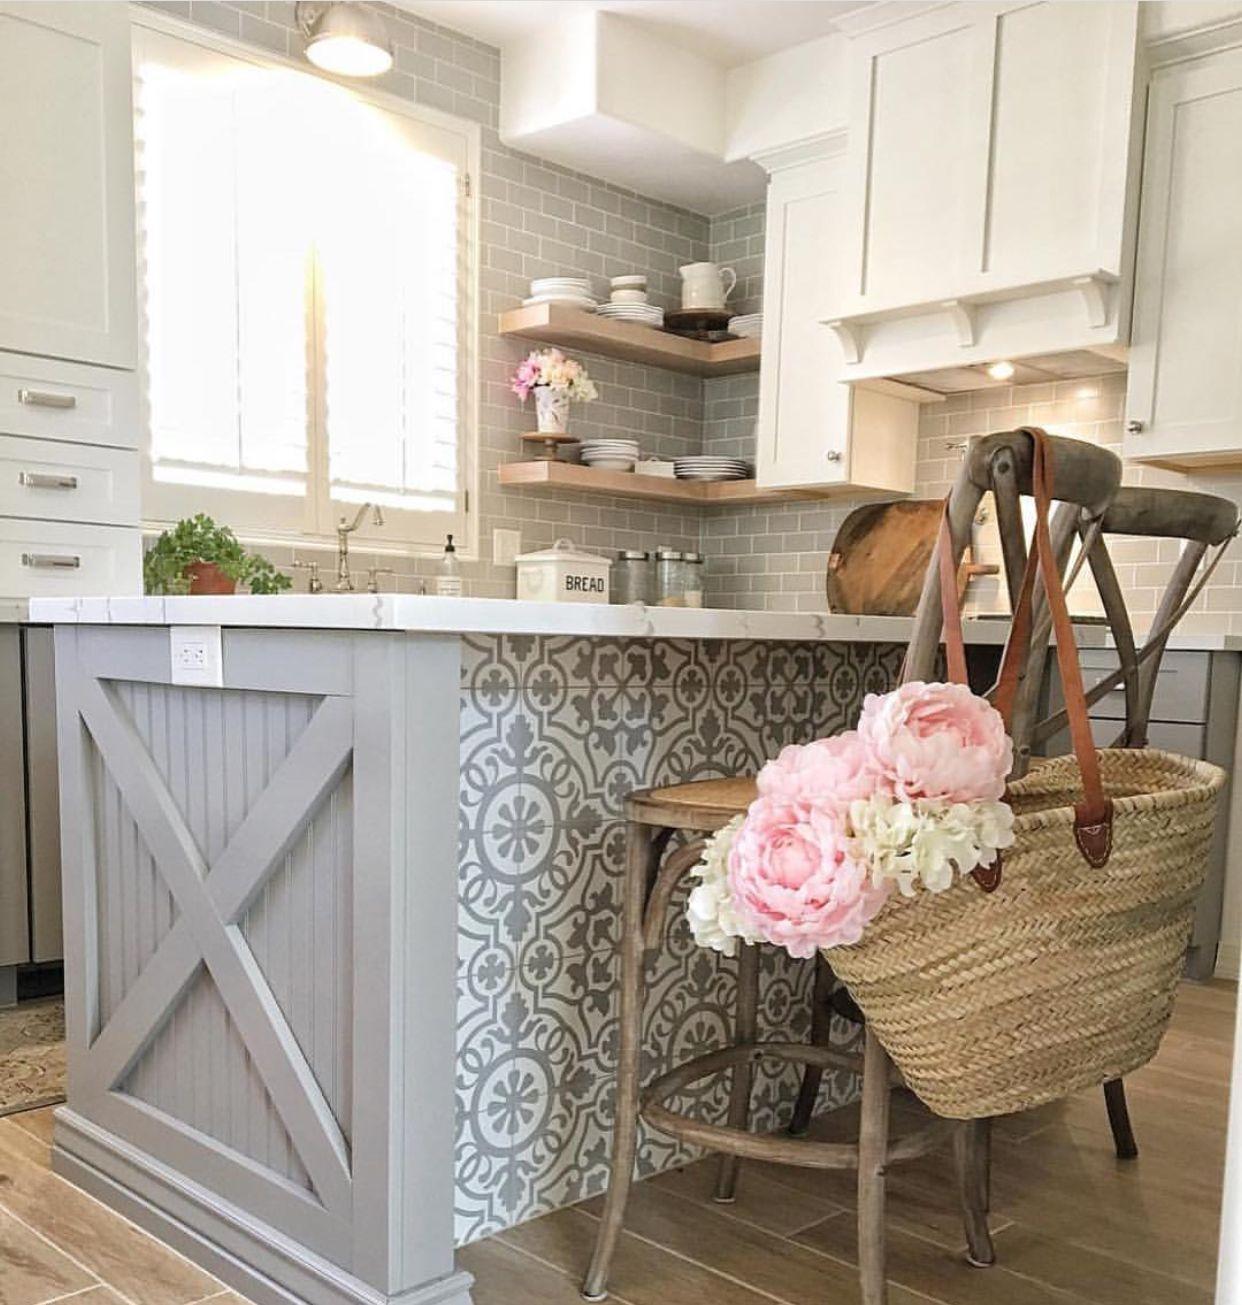 Gray And White Kitchen With Pretty Island Tile Accent Kitchen Remodel Kitchen Diy Makeover Small Kitchen Decor